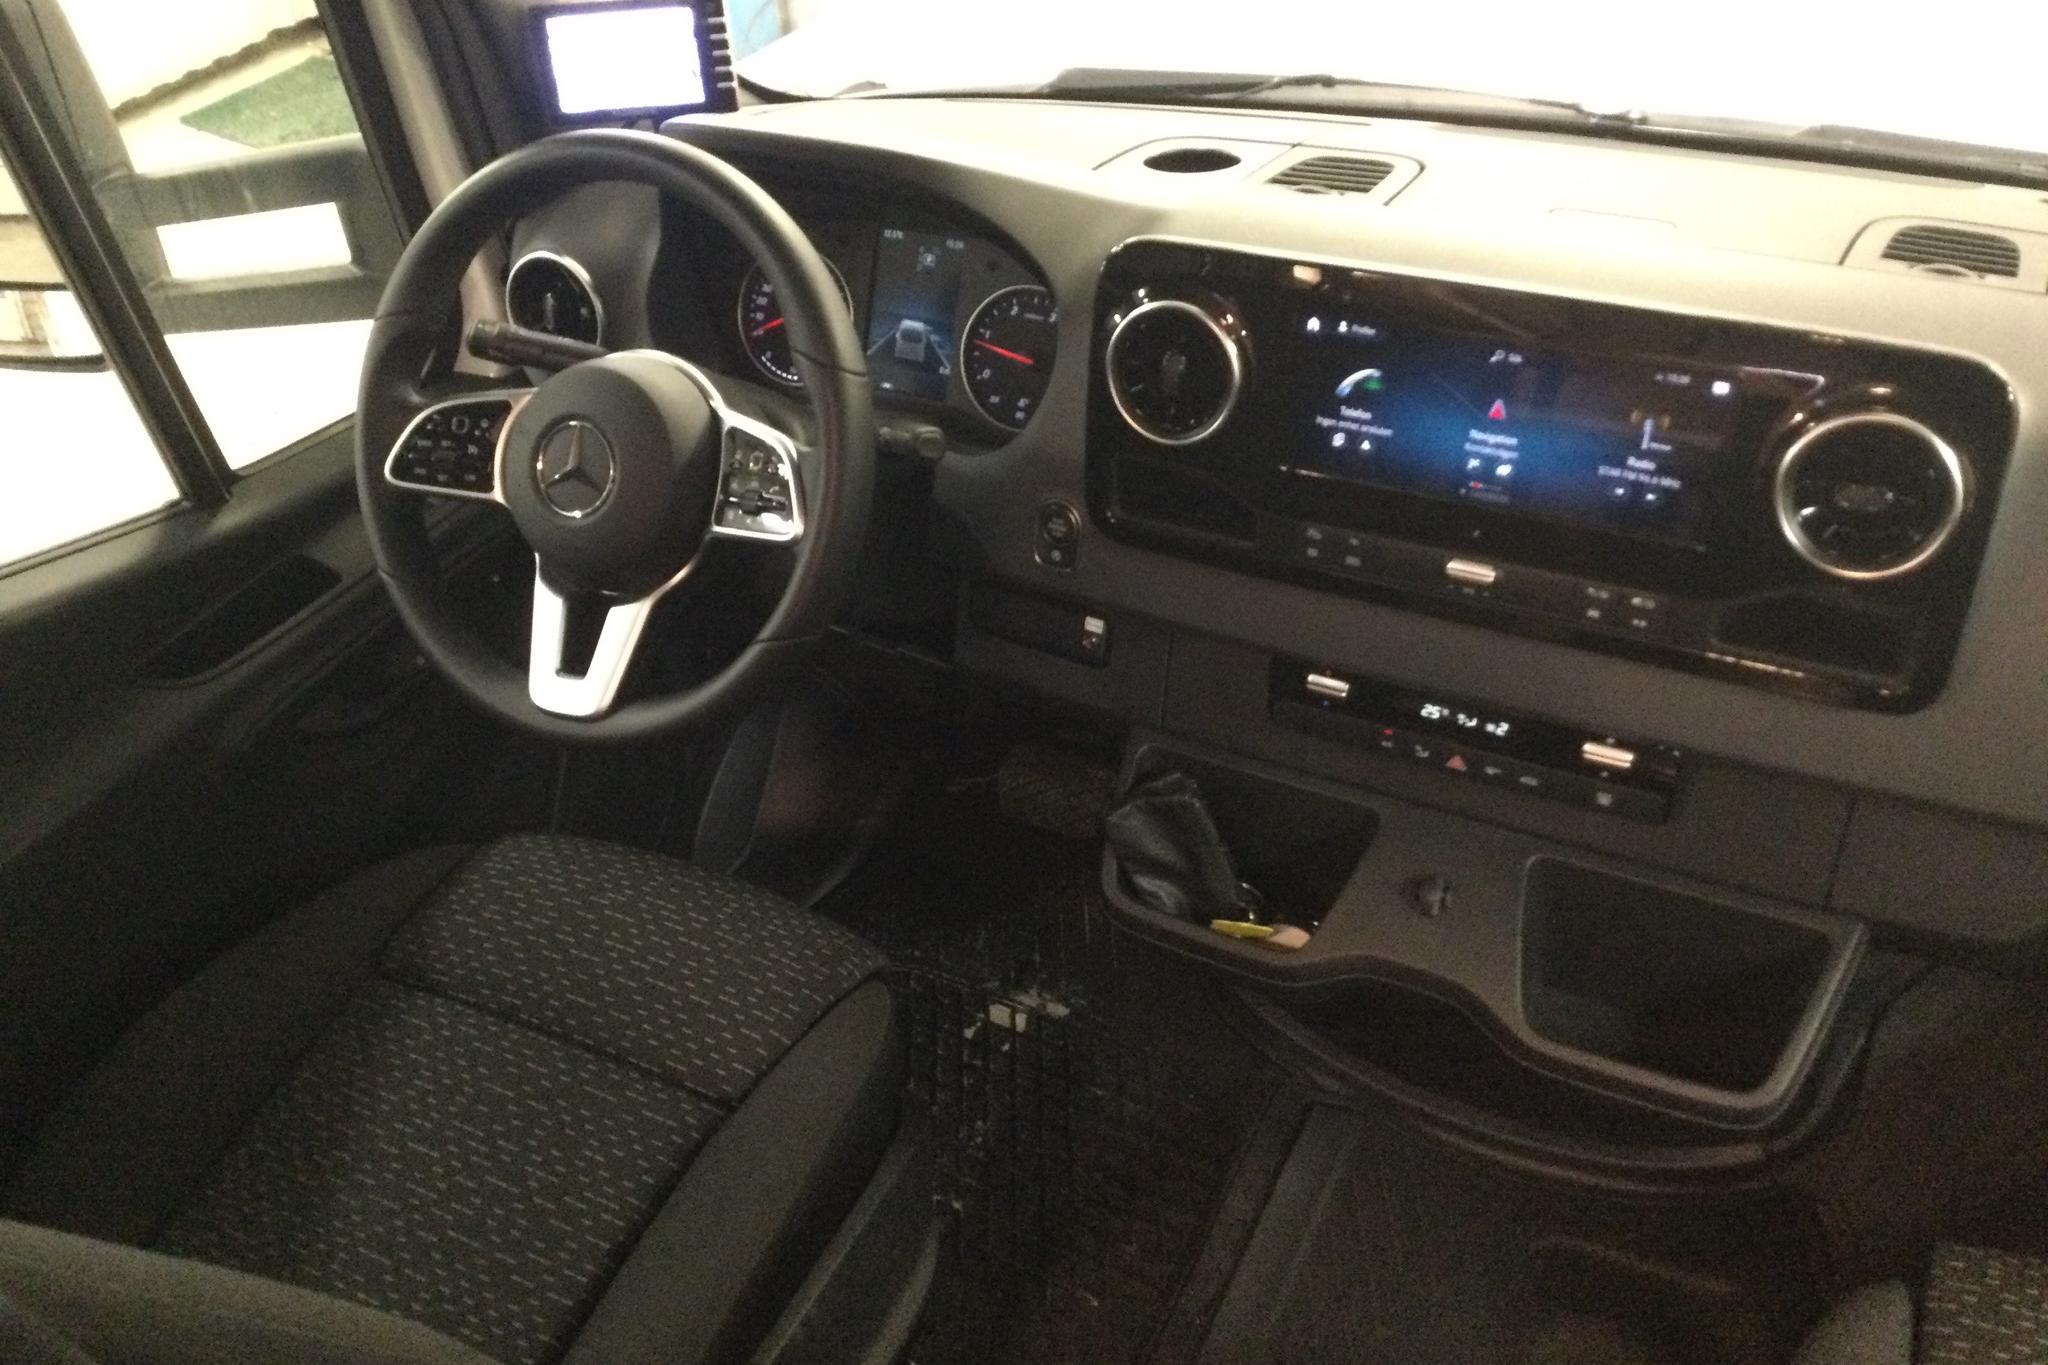 Mercedes-Benz NORDIC EXPEDITION XL Husbil - 416 mil - Automat - vit - 2020